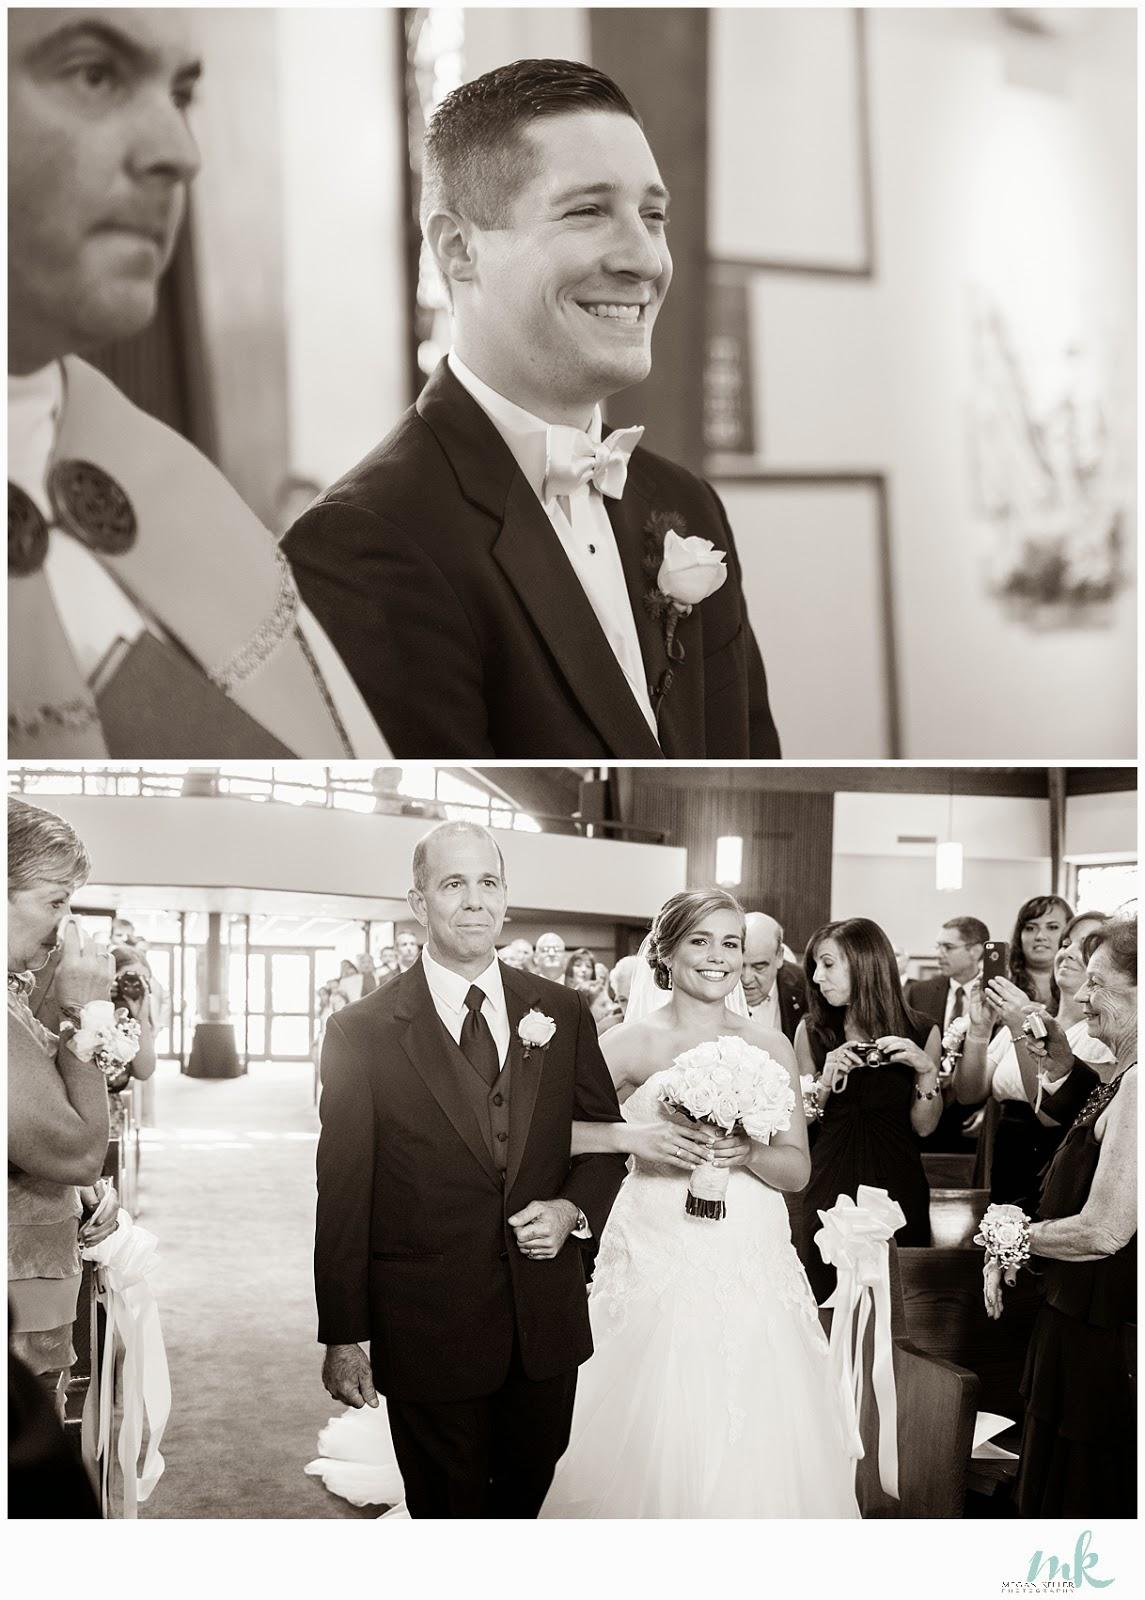 Danielle and Dan's wedding Danielle and Dan's wedding 2014 07 16 0003